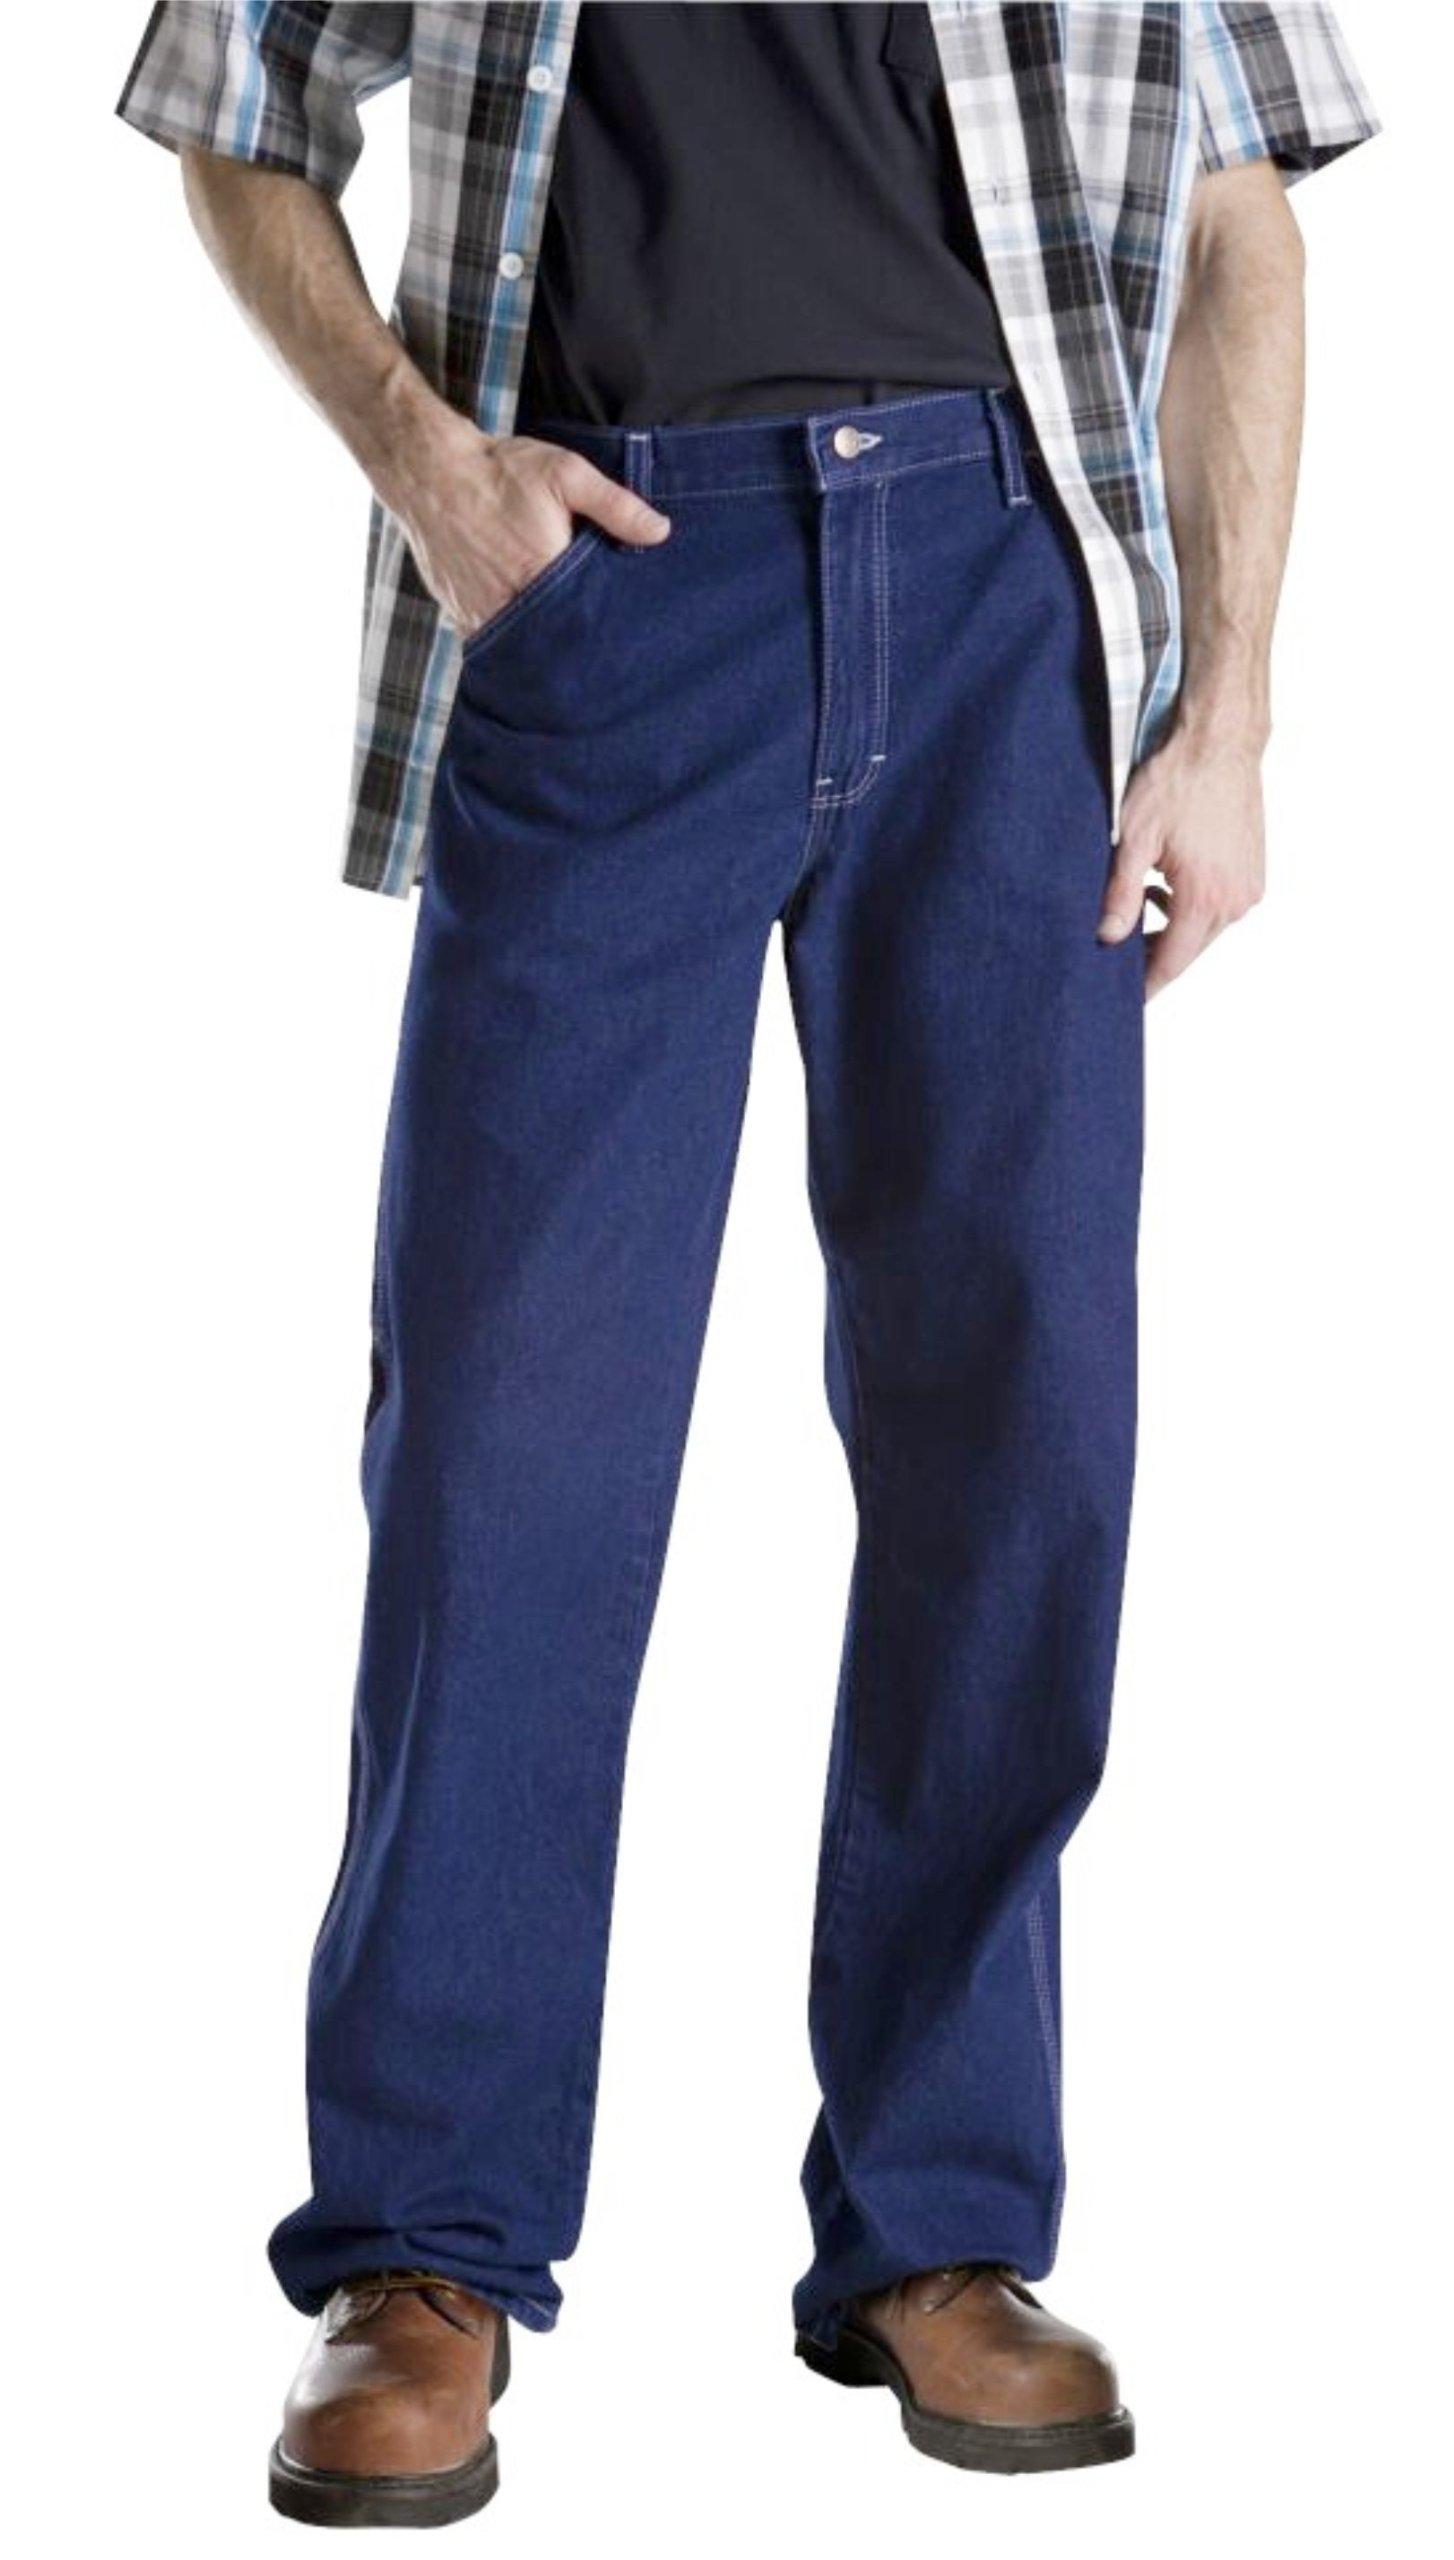 Dickies Men's Relaxed Fit Carpenter Jean, Indigo Rigid, 38x32